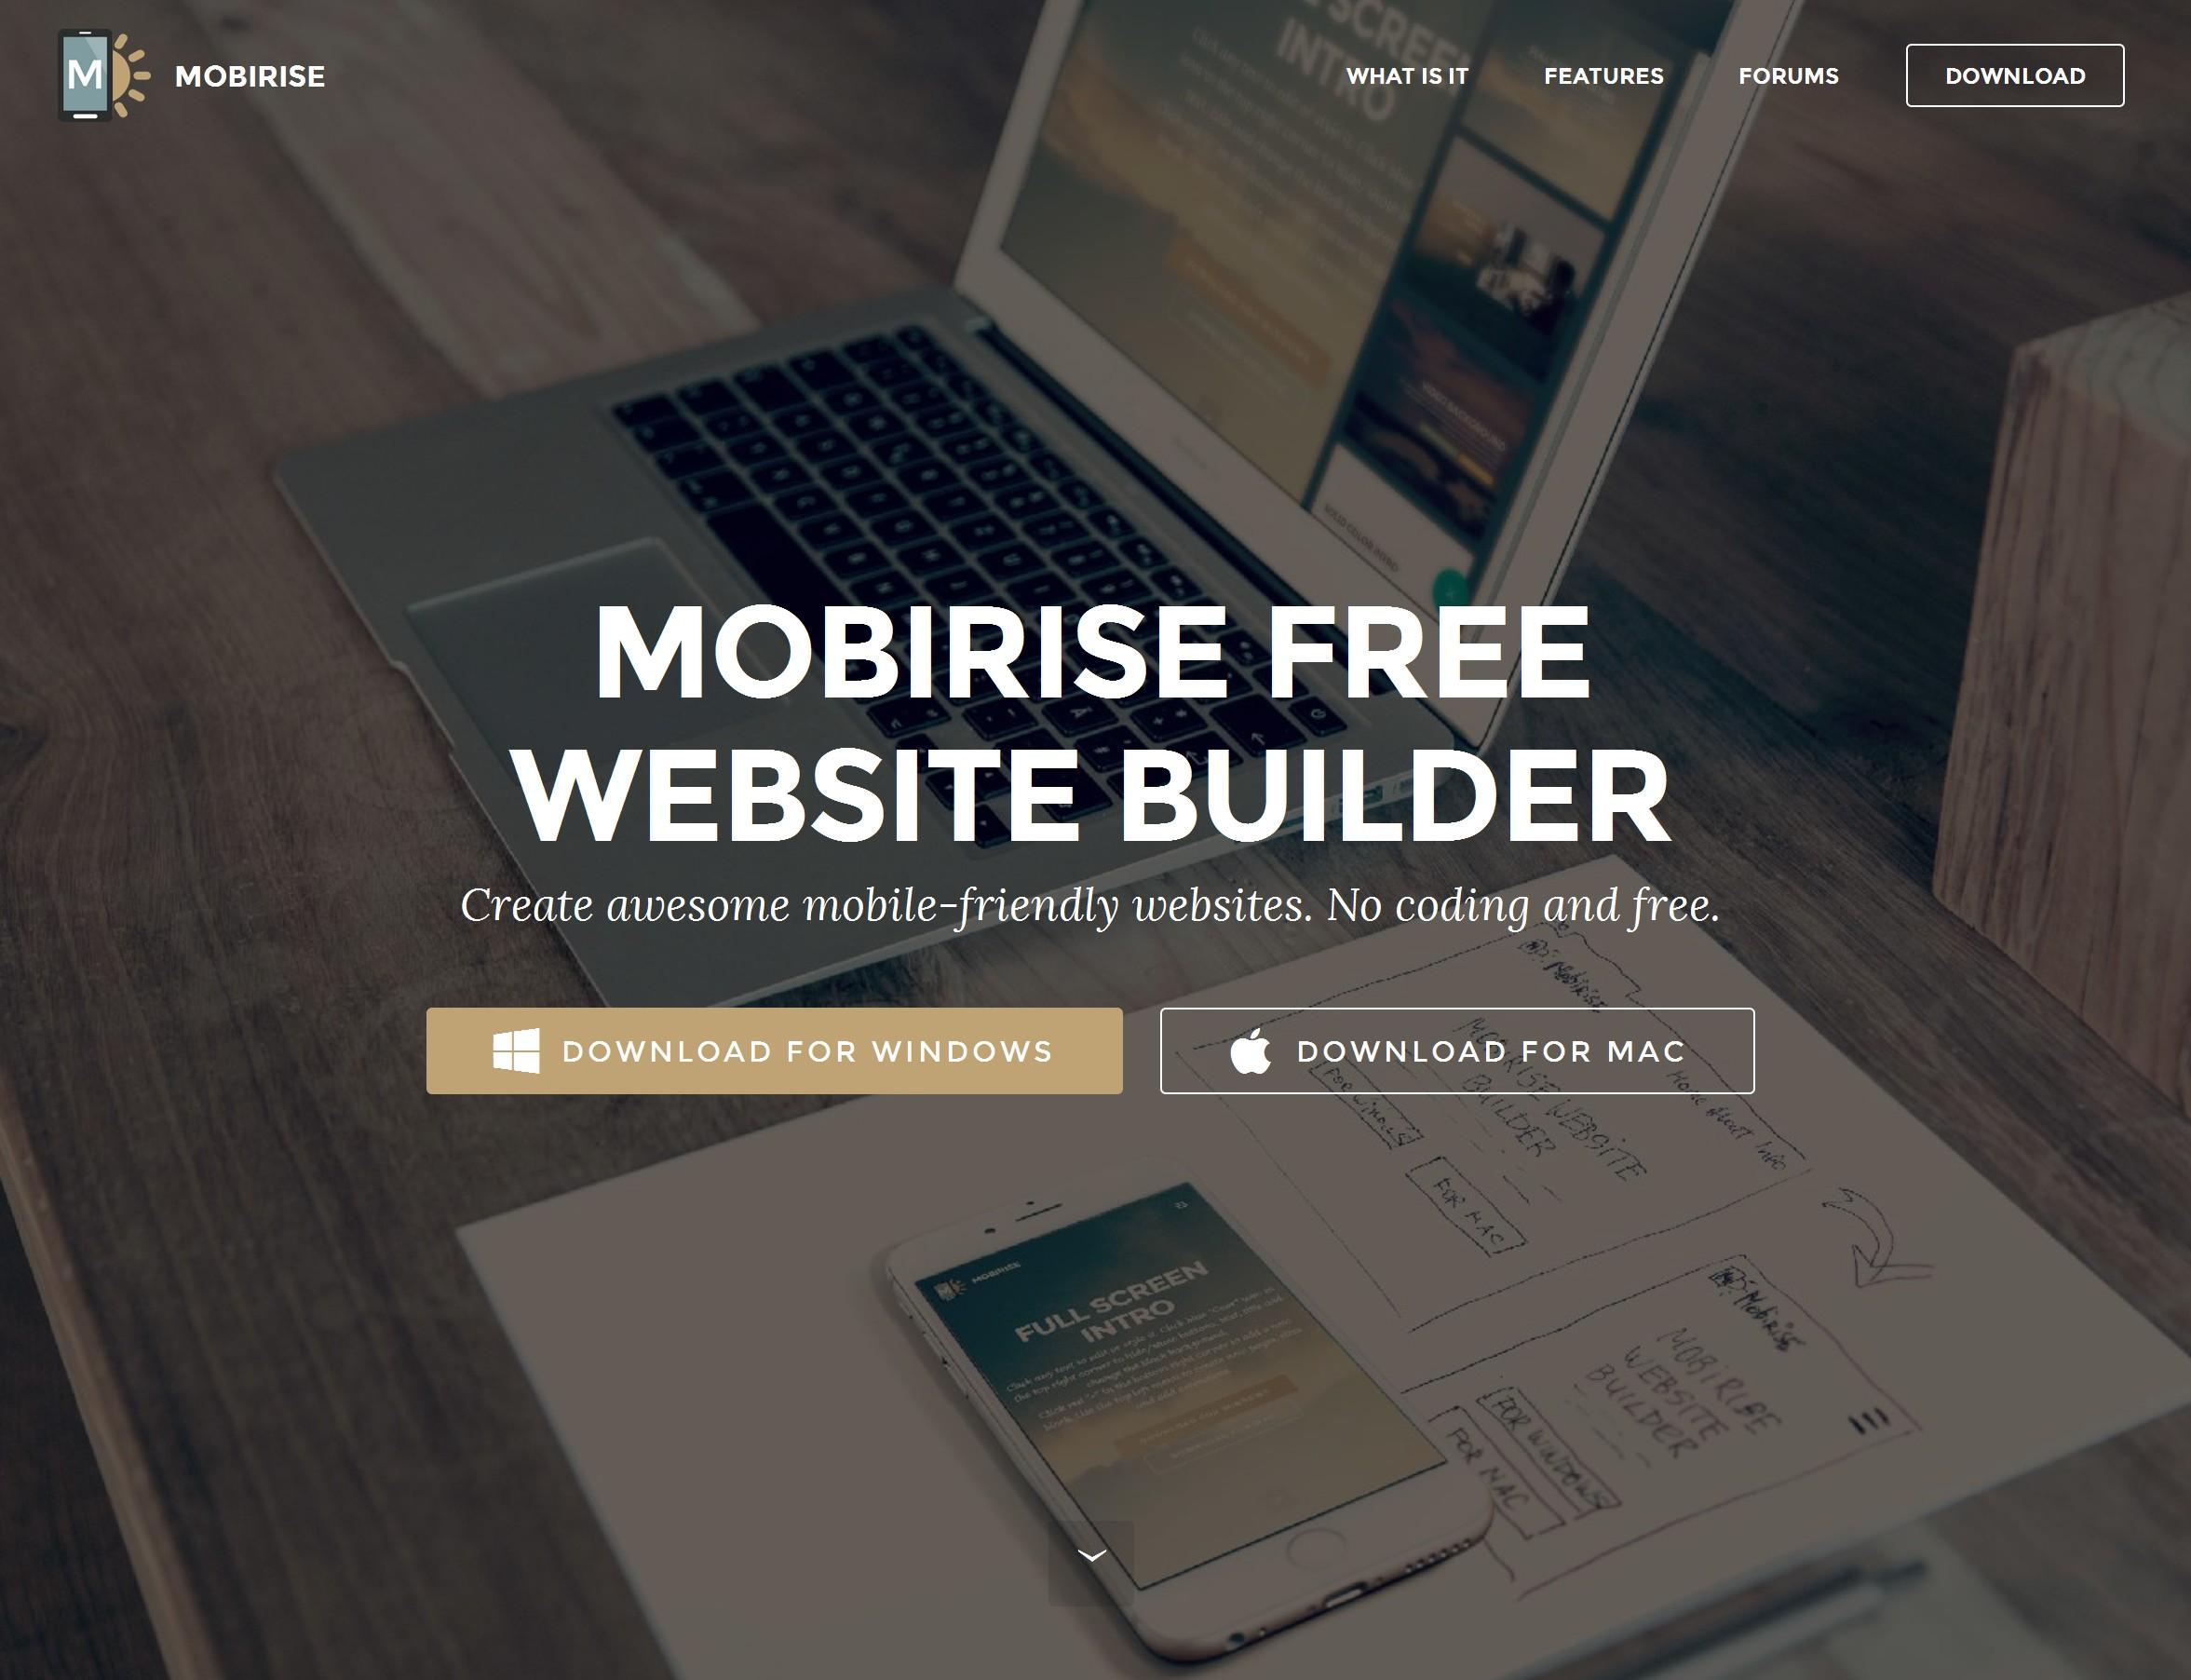 HTML Responsive Web Site Creator Review